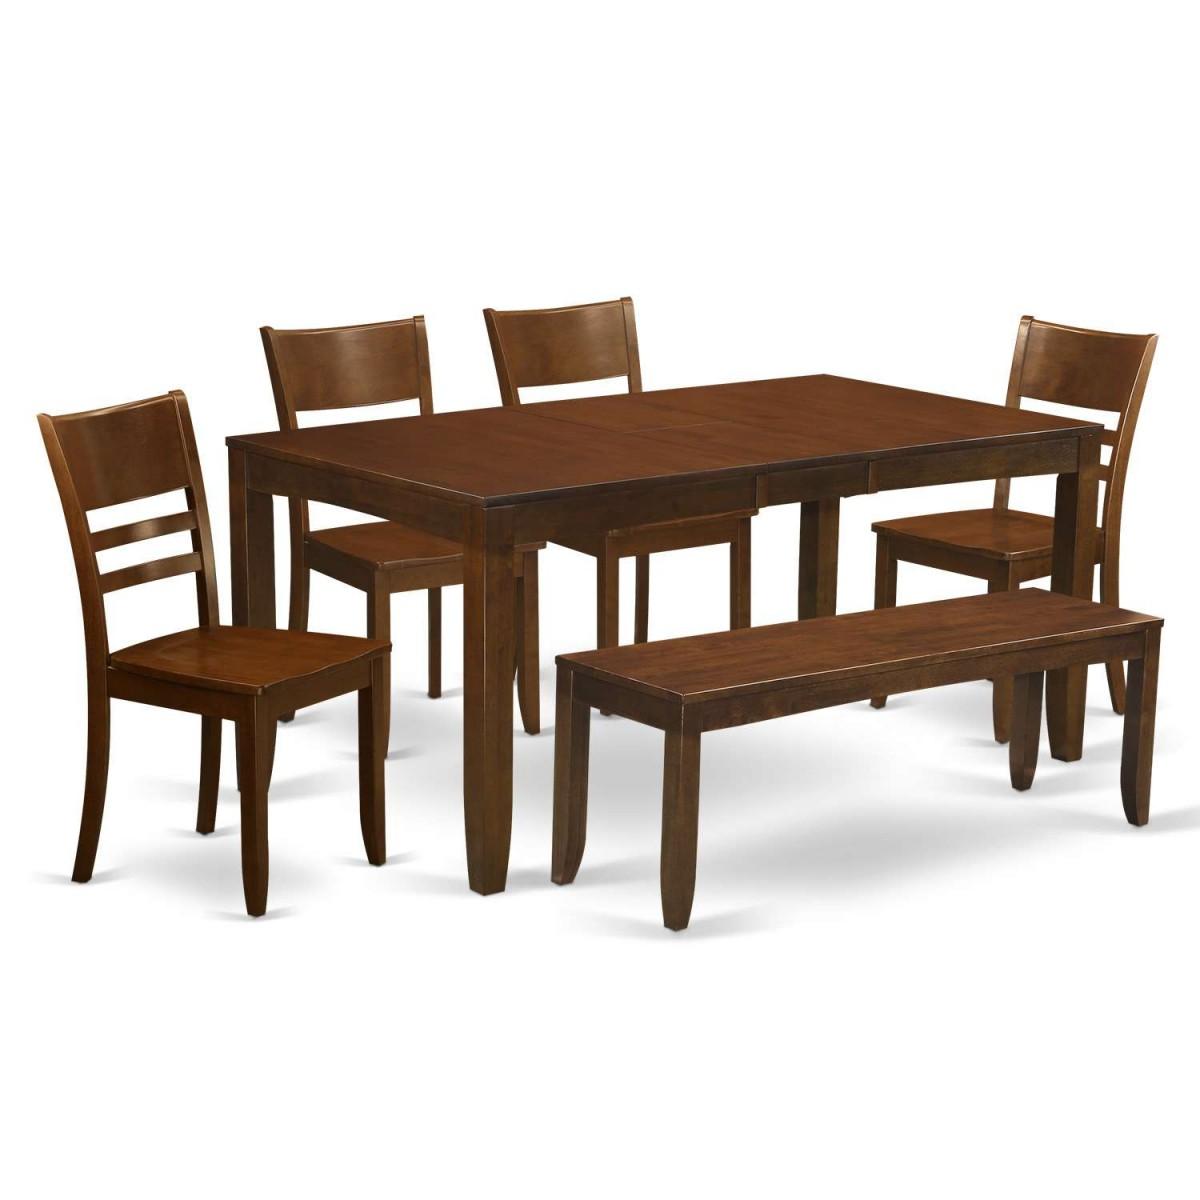 Wooden Importers Lynfield 6 Piece Dining Set: East West Furniture Lynfield 6 Piece Dining Table Set